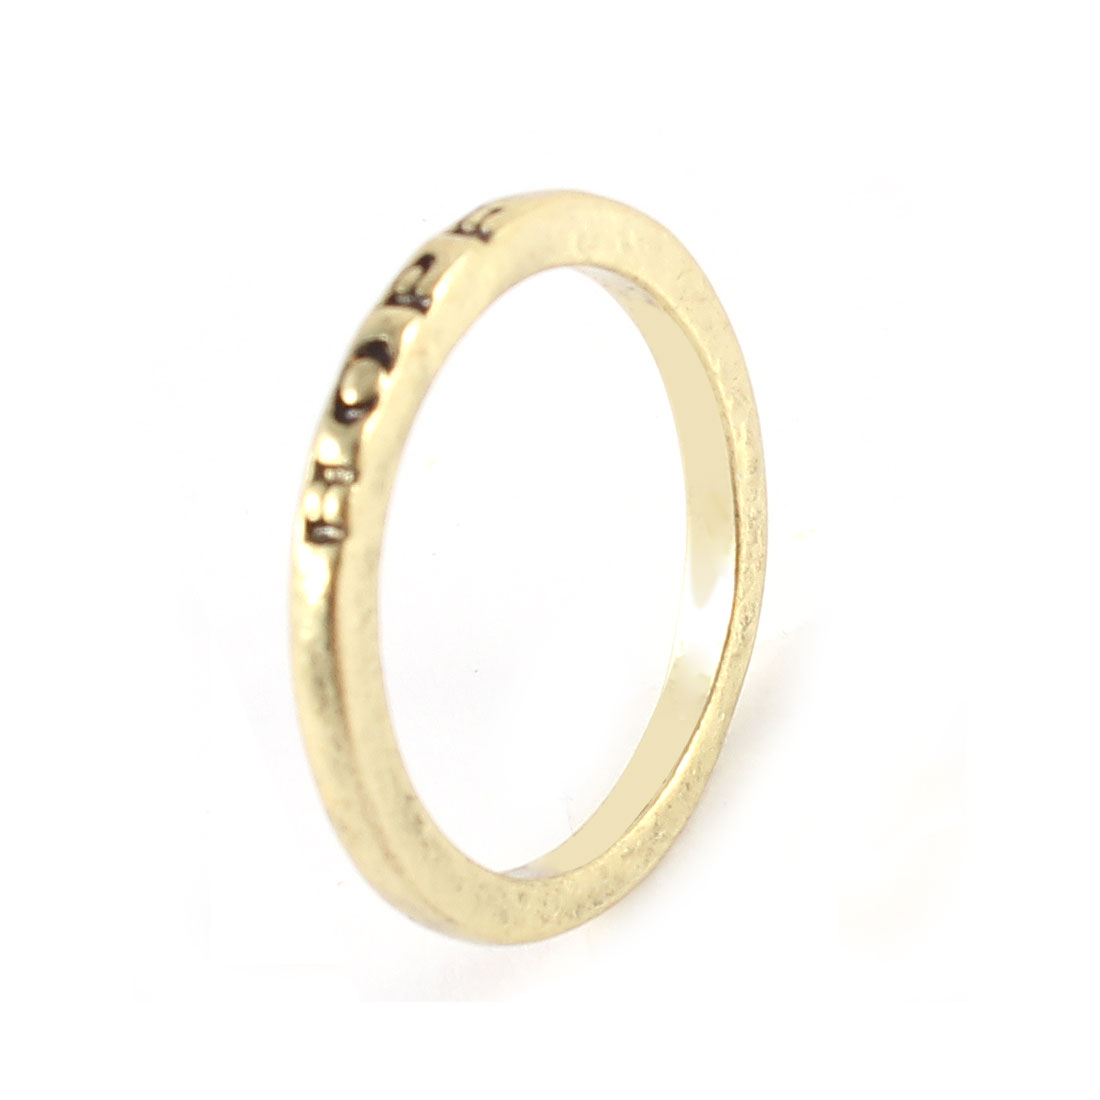 Ladies Bronze Tone Metal Hope Letter Carved Finger Ring Decoration Gift